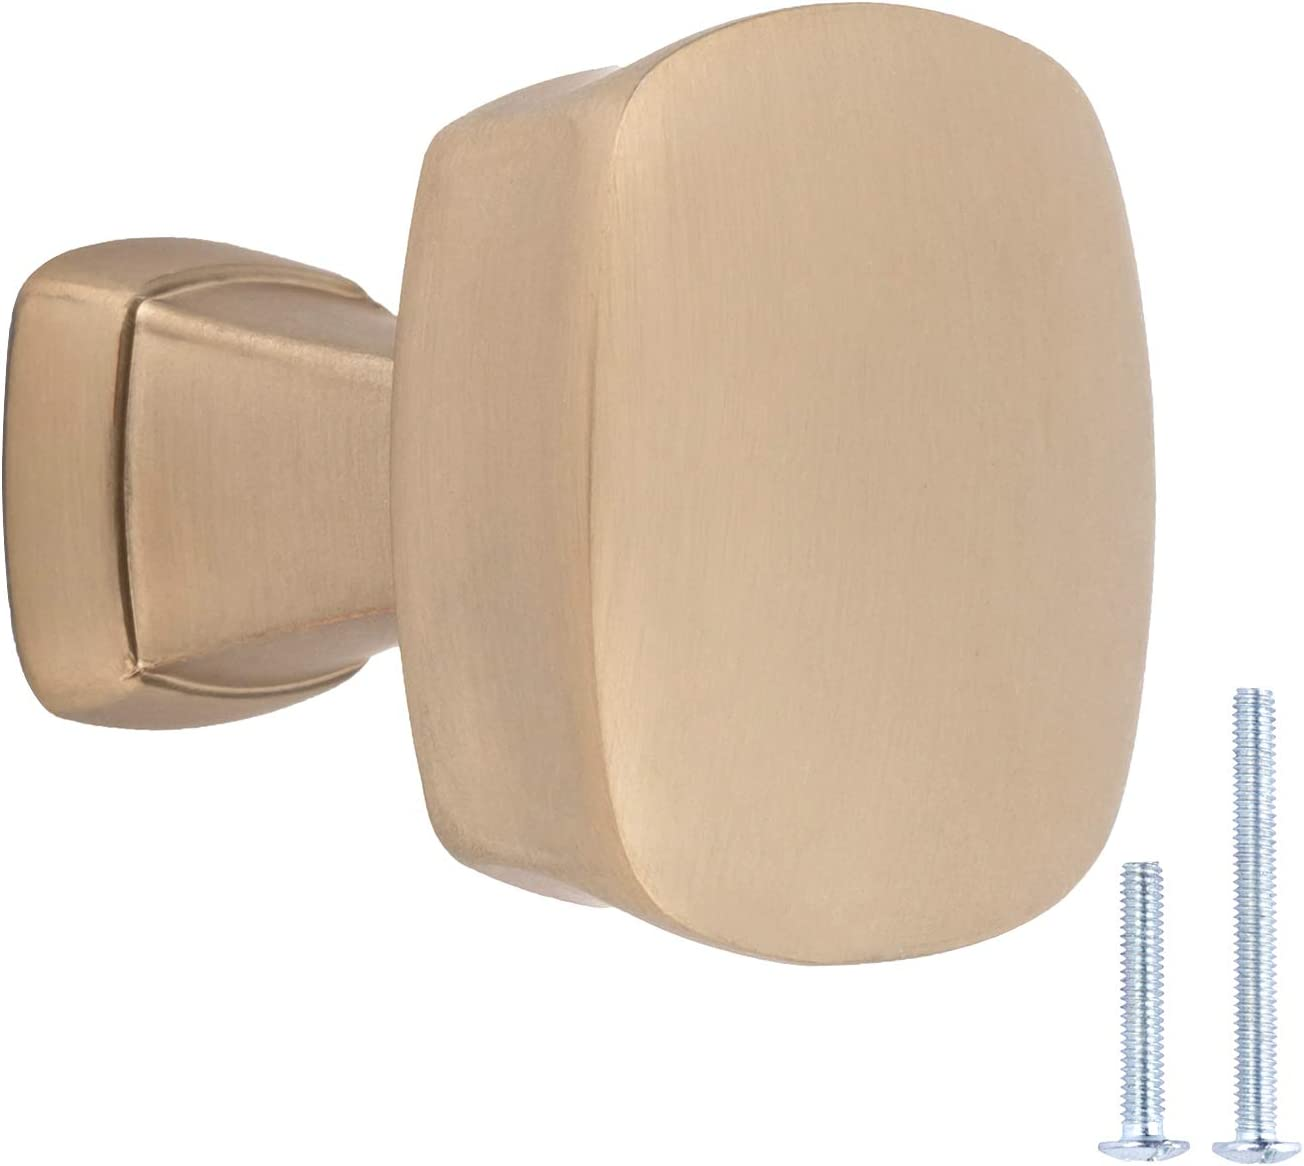 Amazon Basics Rounded Square Cabinet 1.26-inch Tulsa Mall G Diameter Recommendation Knob